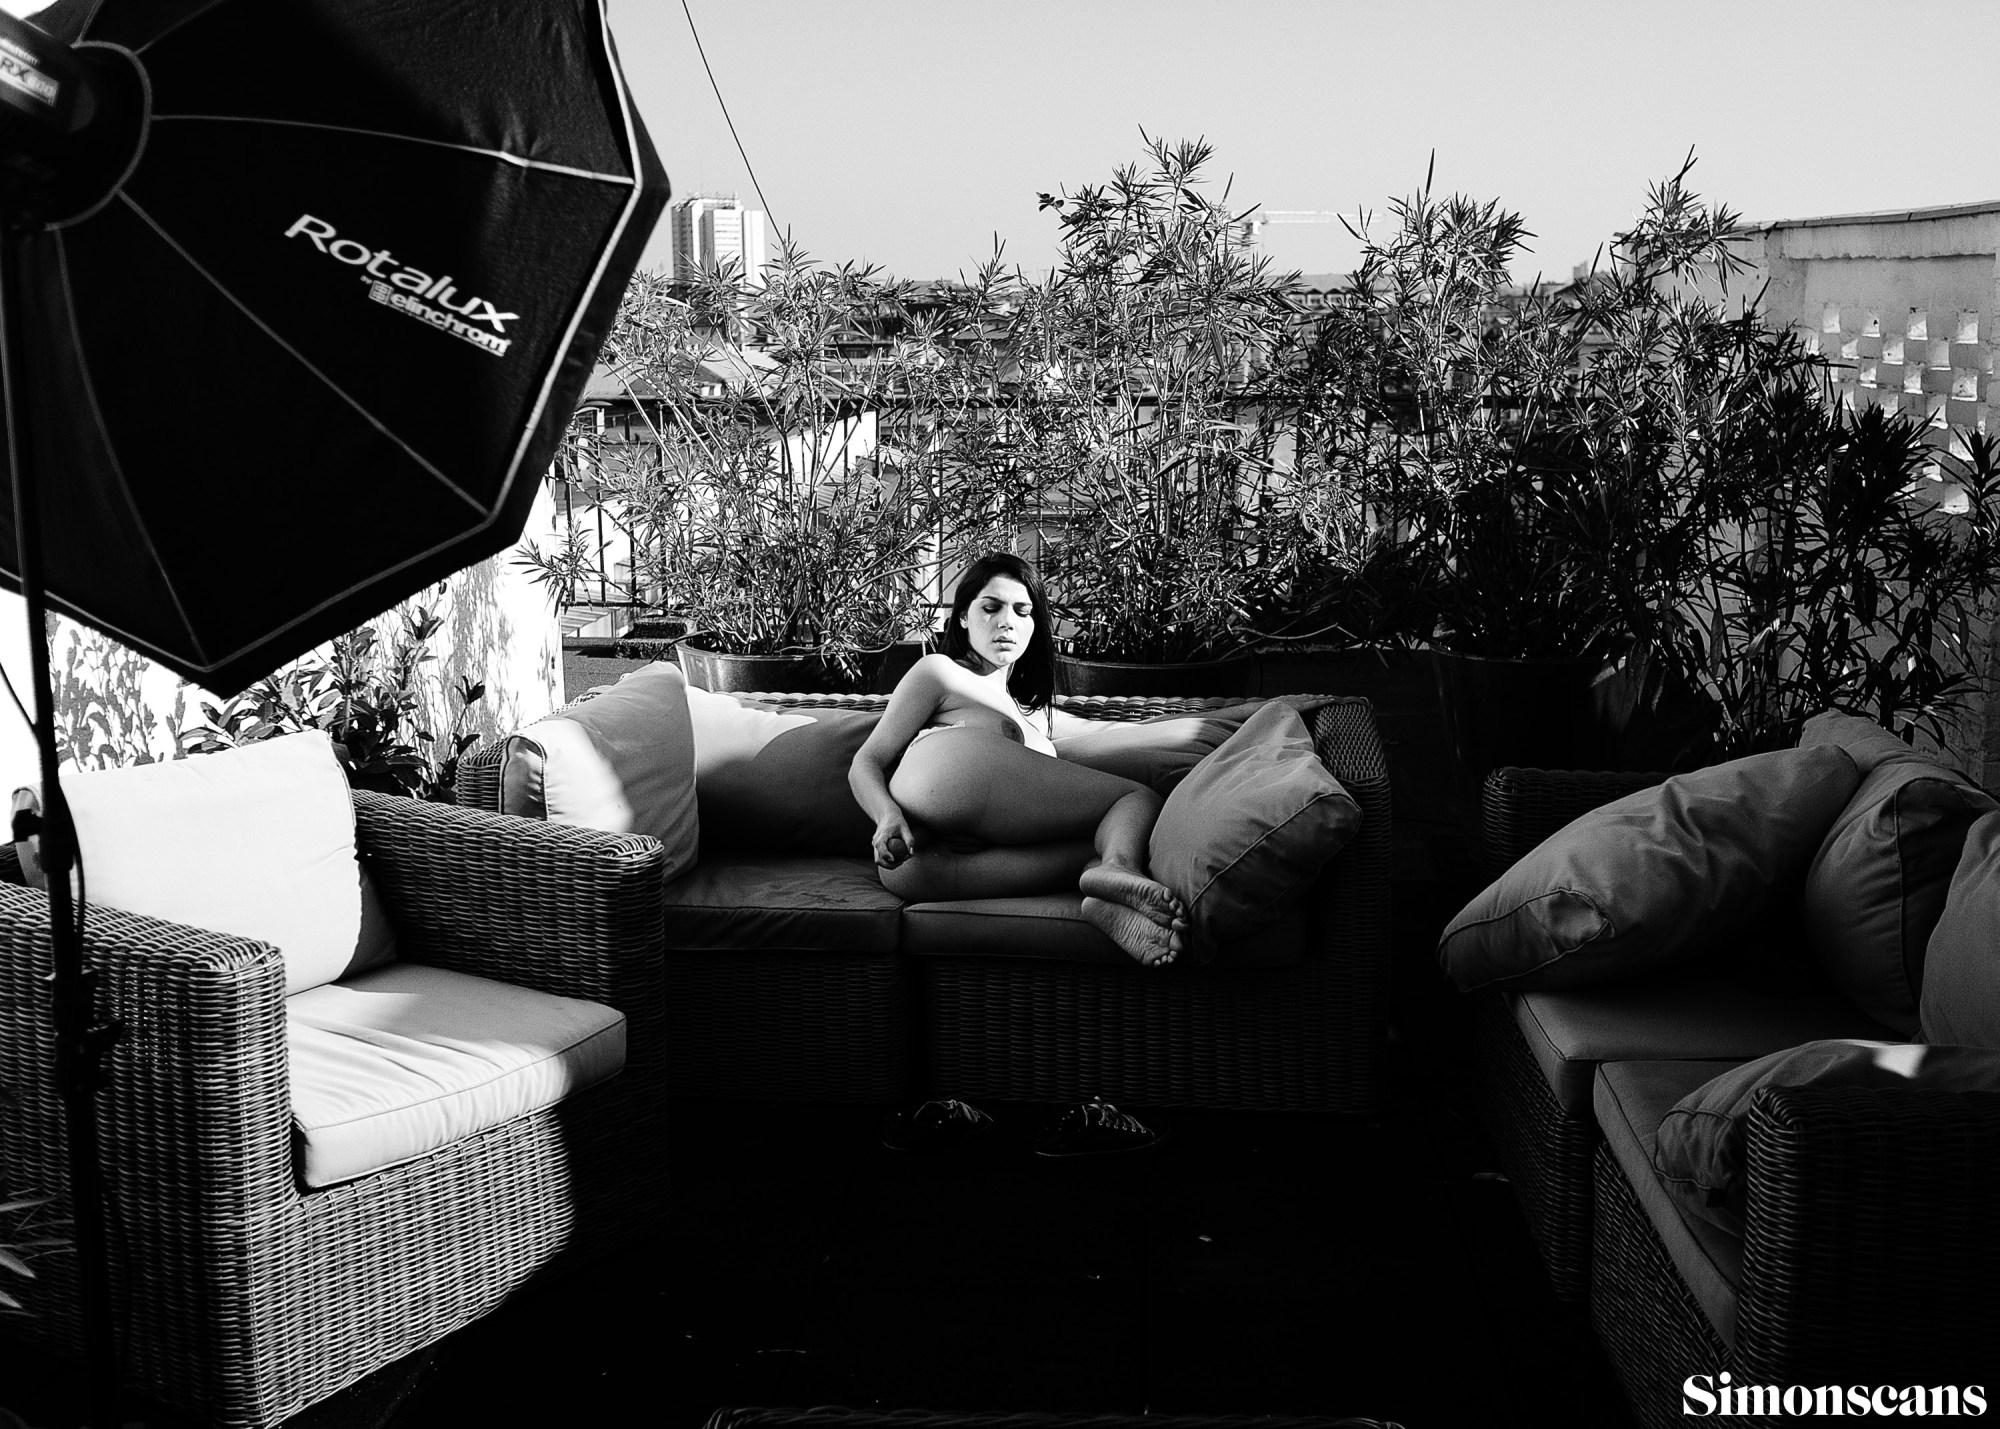 Valentina Nappi in black and white BTS